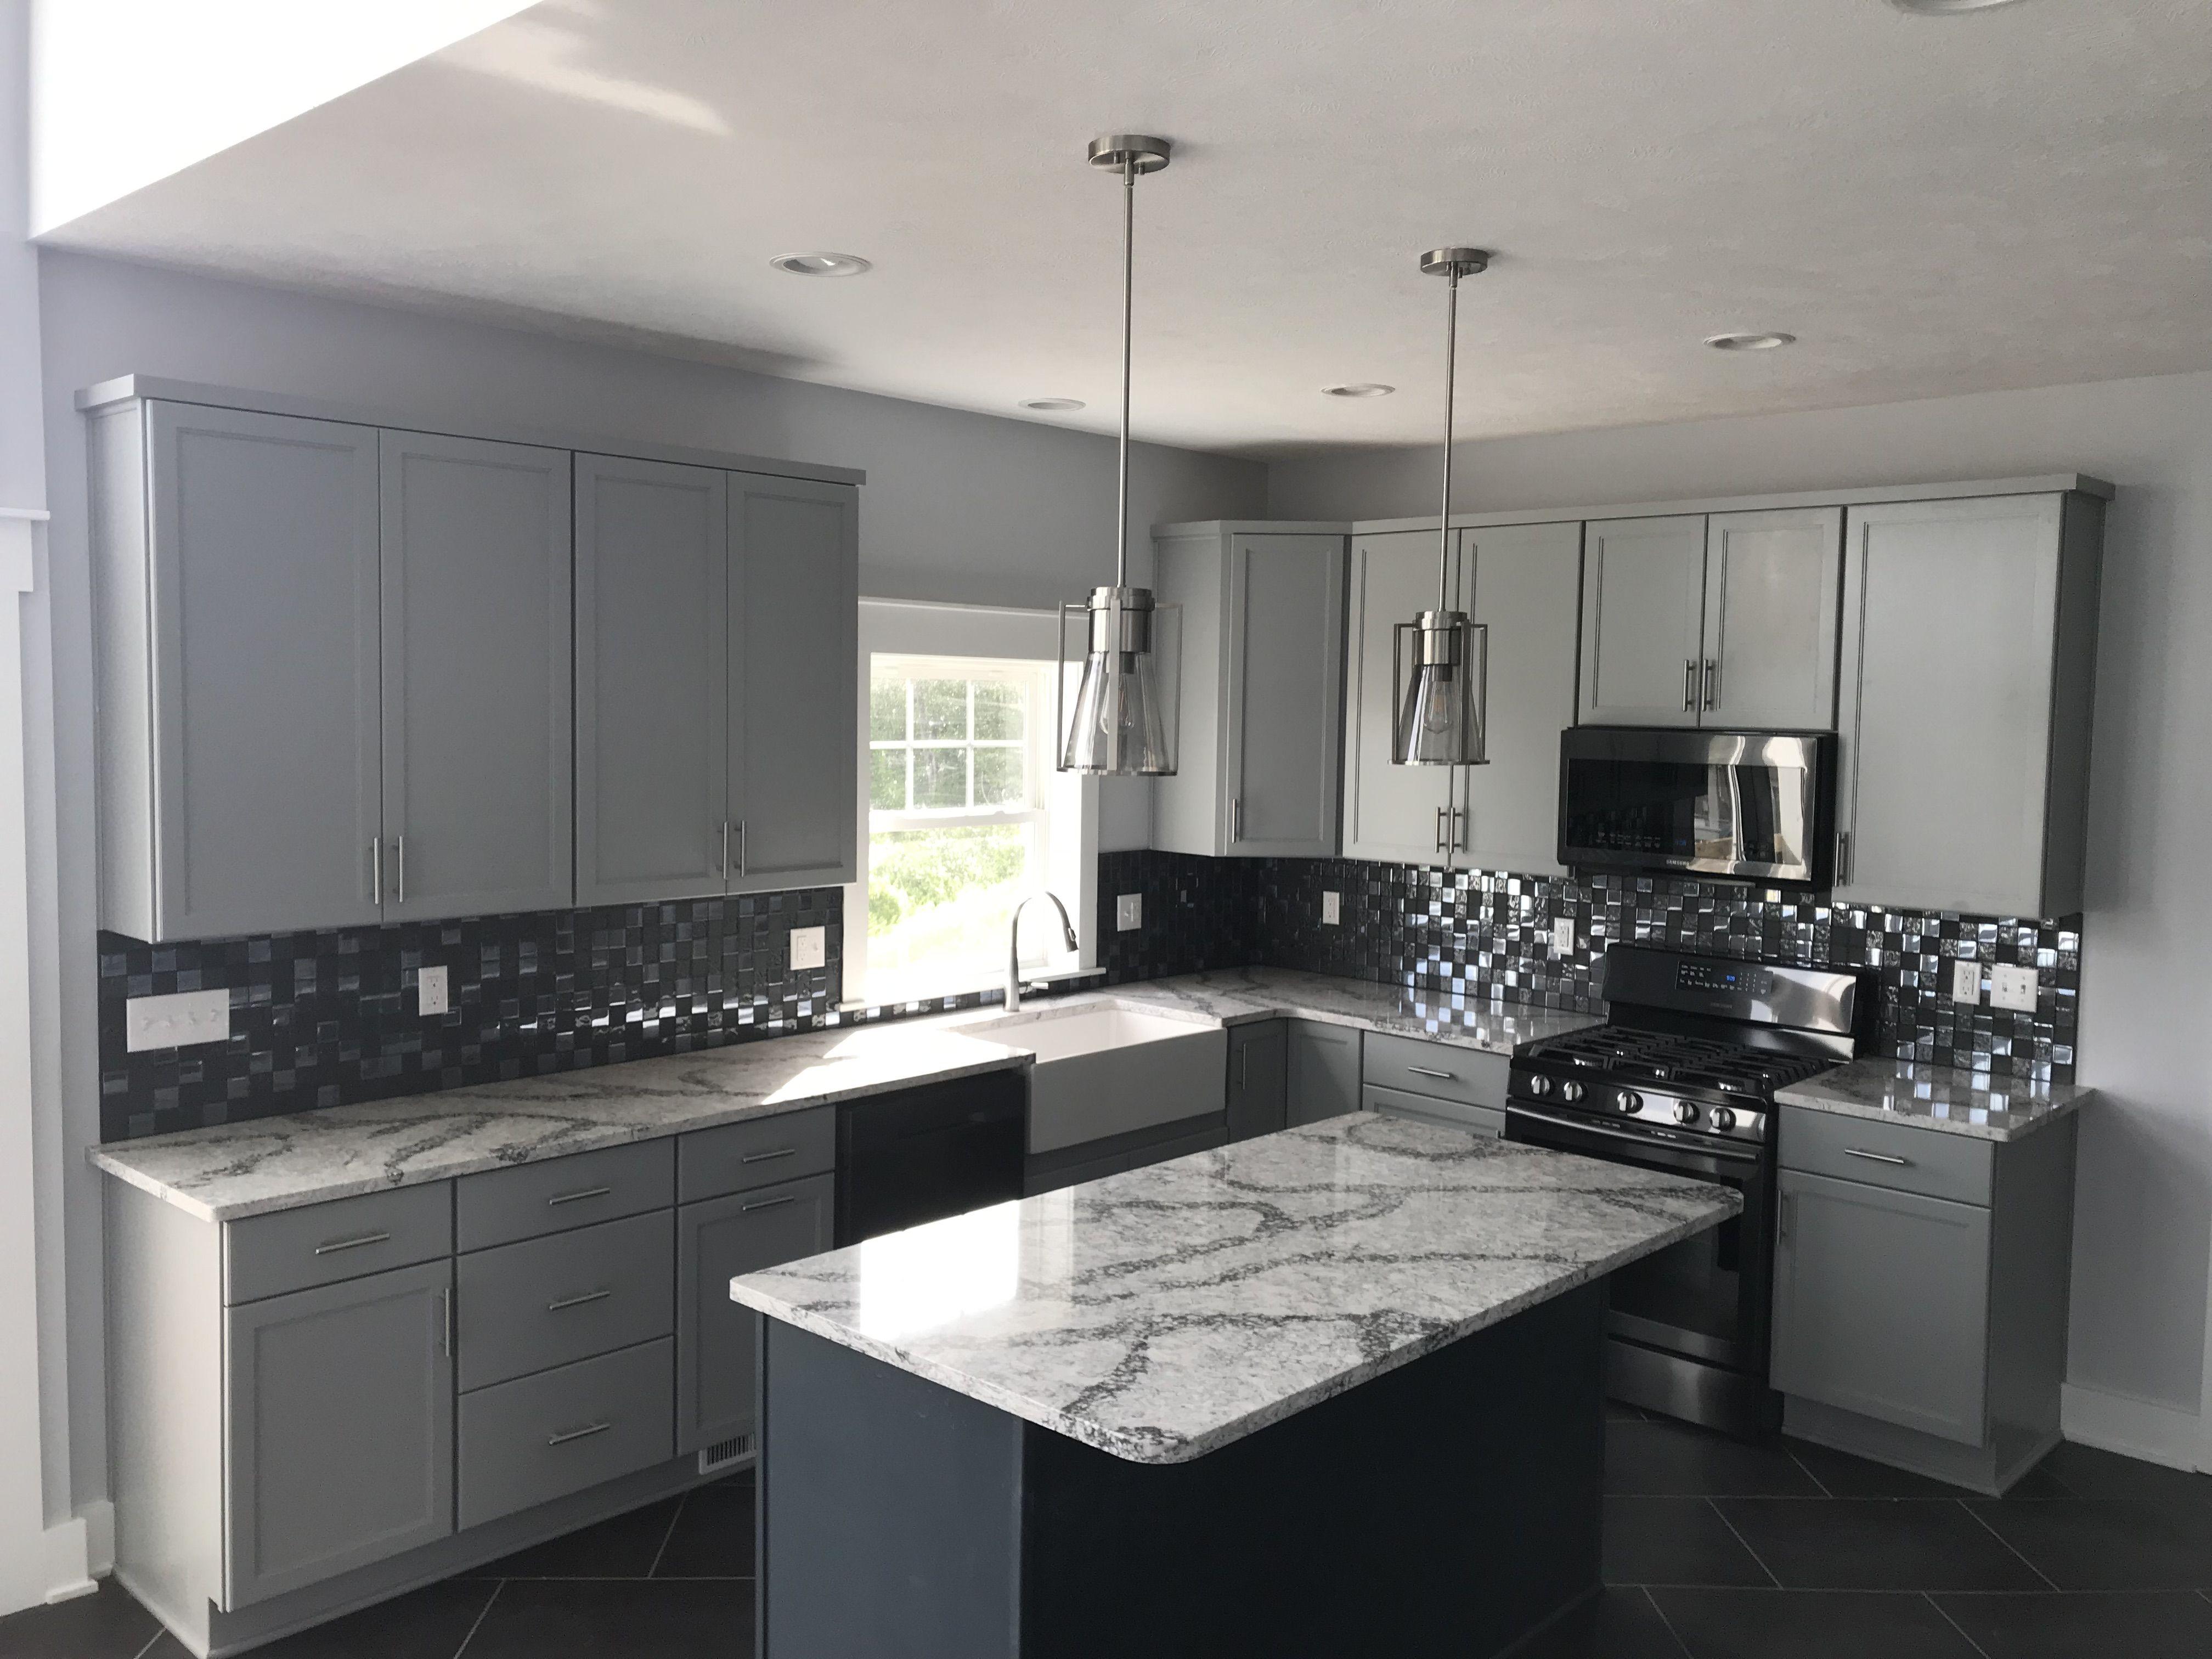 Fabulous New Kitchen Kemper Cabinets Juniper Berry Perimeter With Maritime Island Cambria Seagrove Counter Tops New Kitchen Kitchen Sweet Home